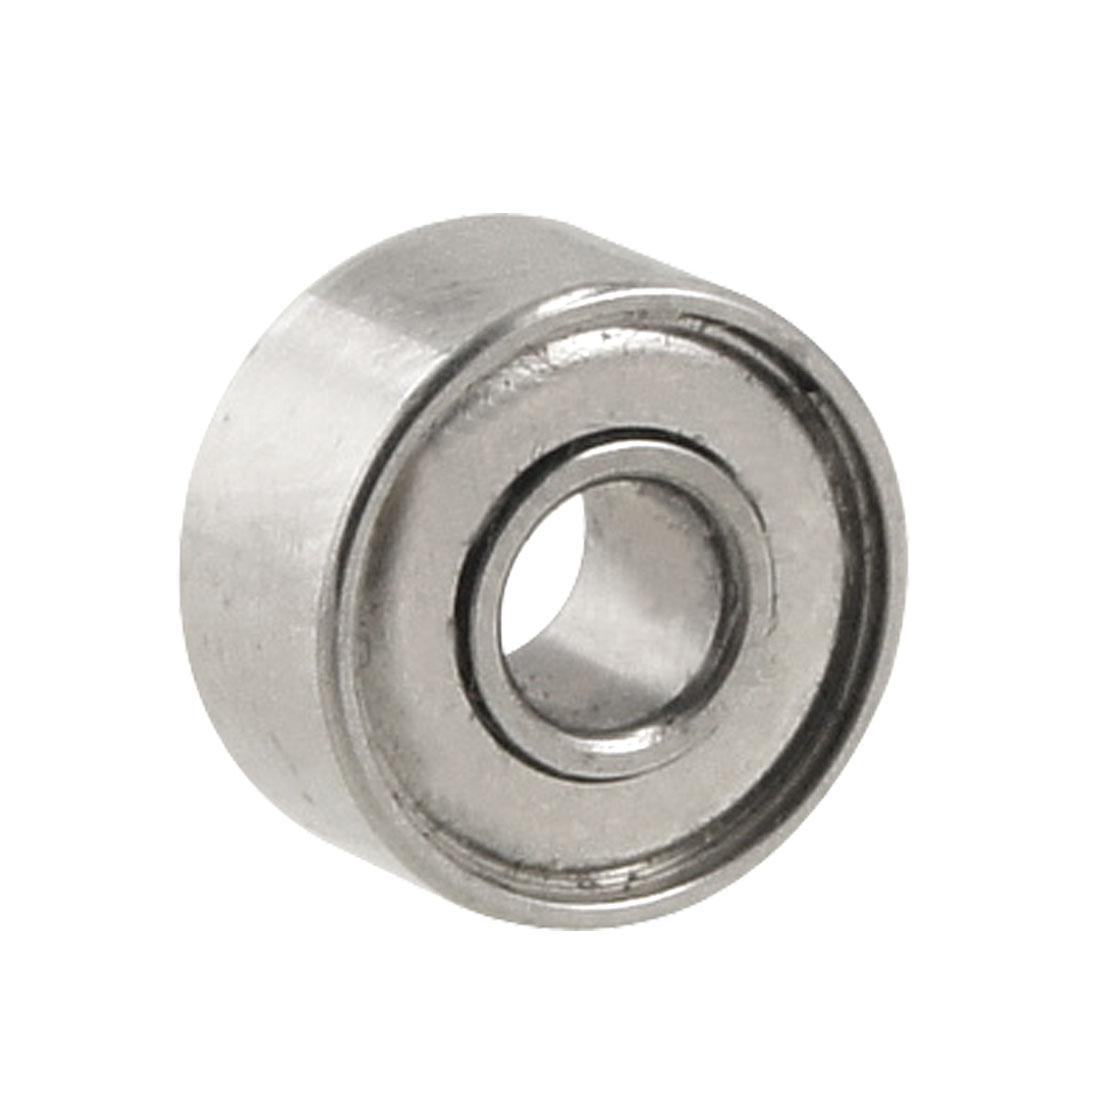 Silver Tone Magnetic 8mm x 3mm x 4mm Shield Premium Ball Bearing